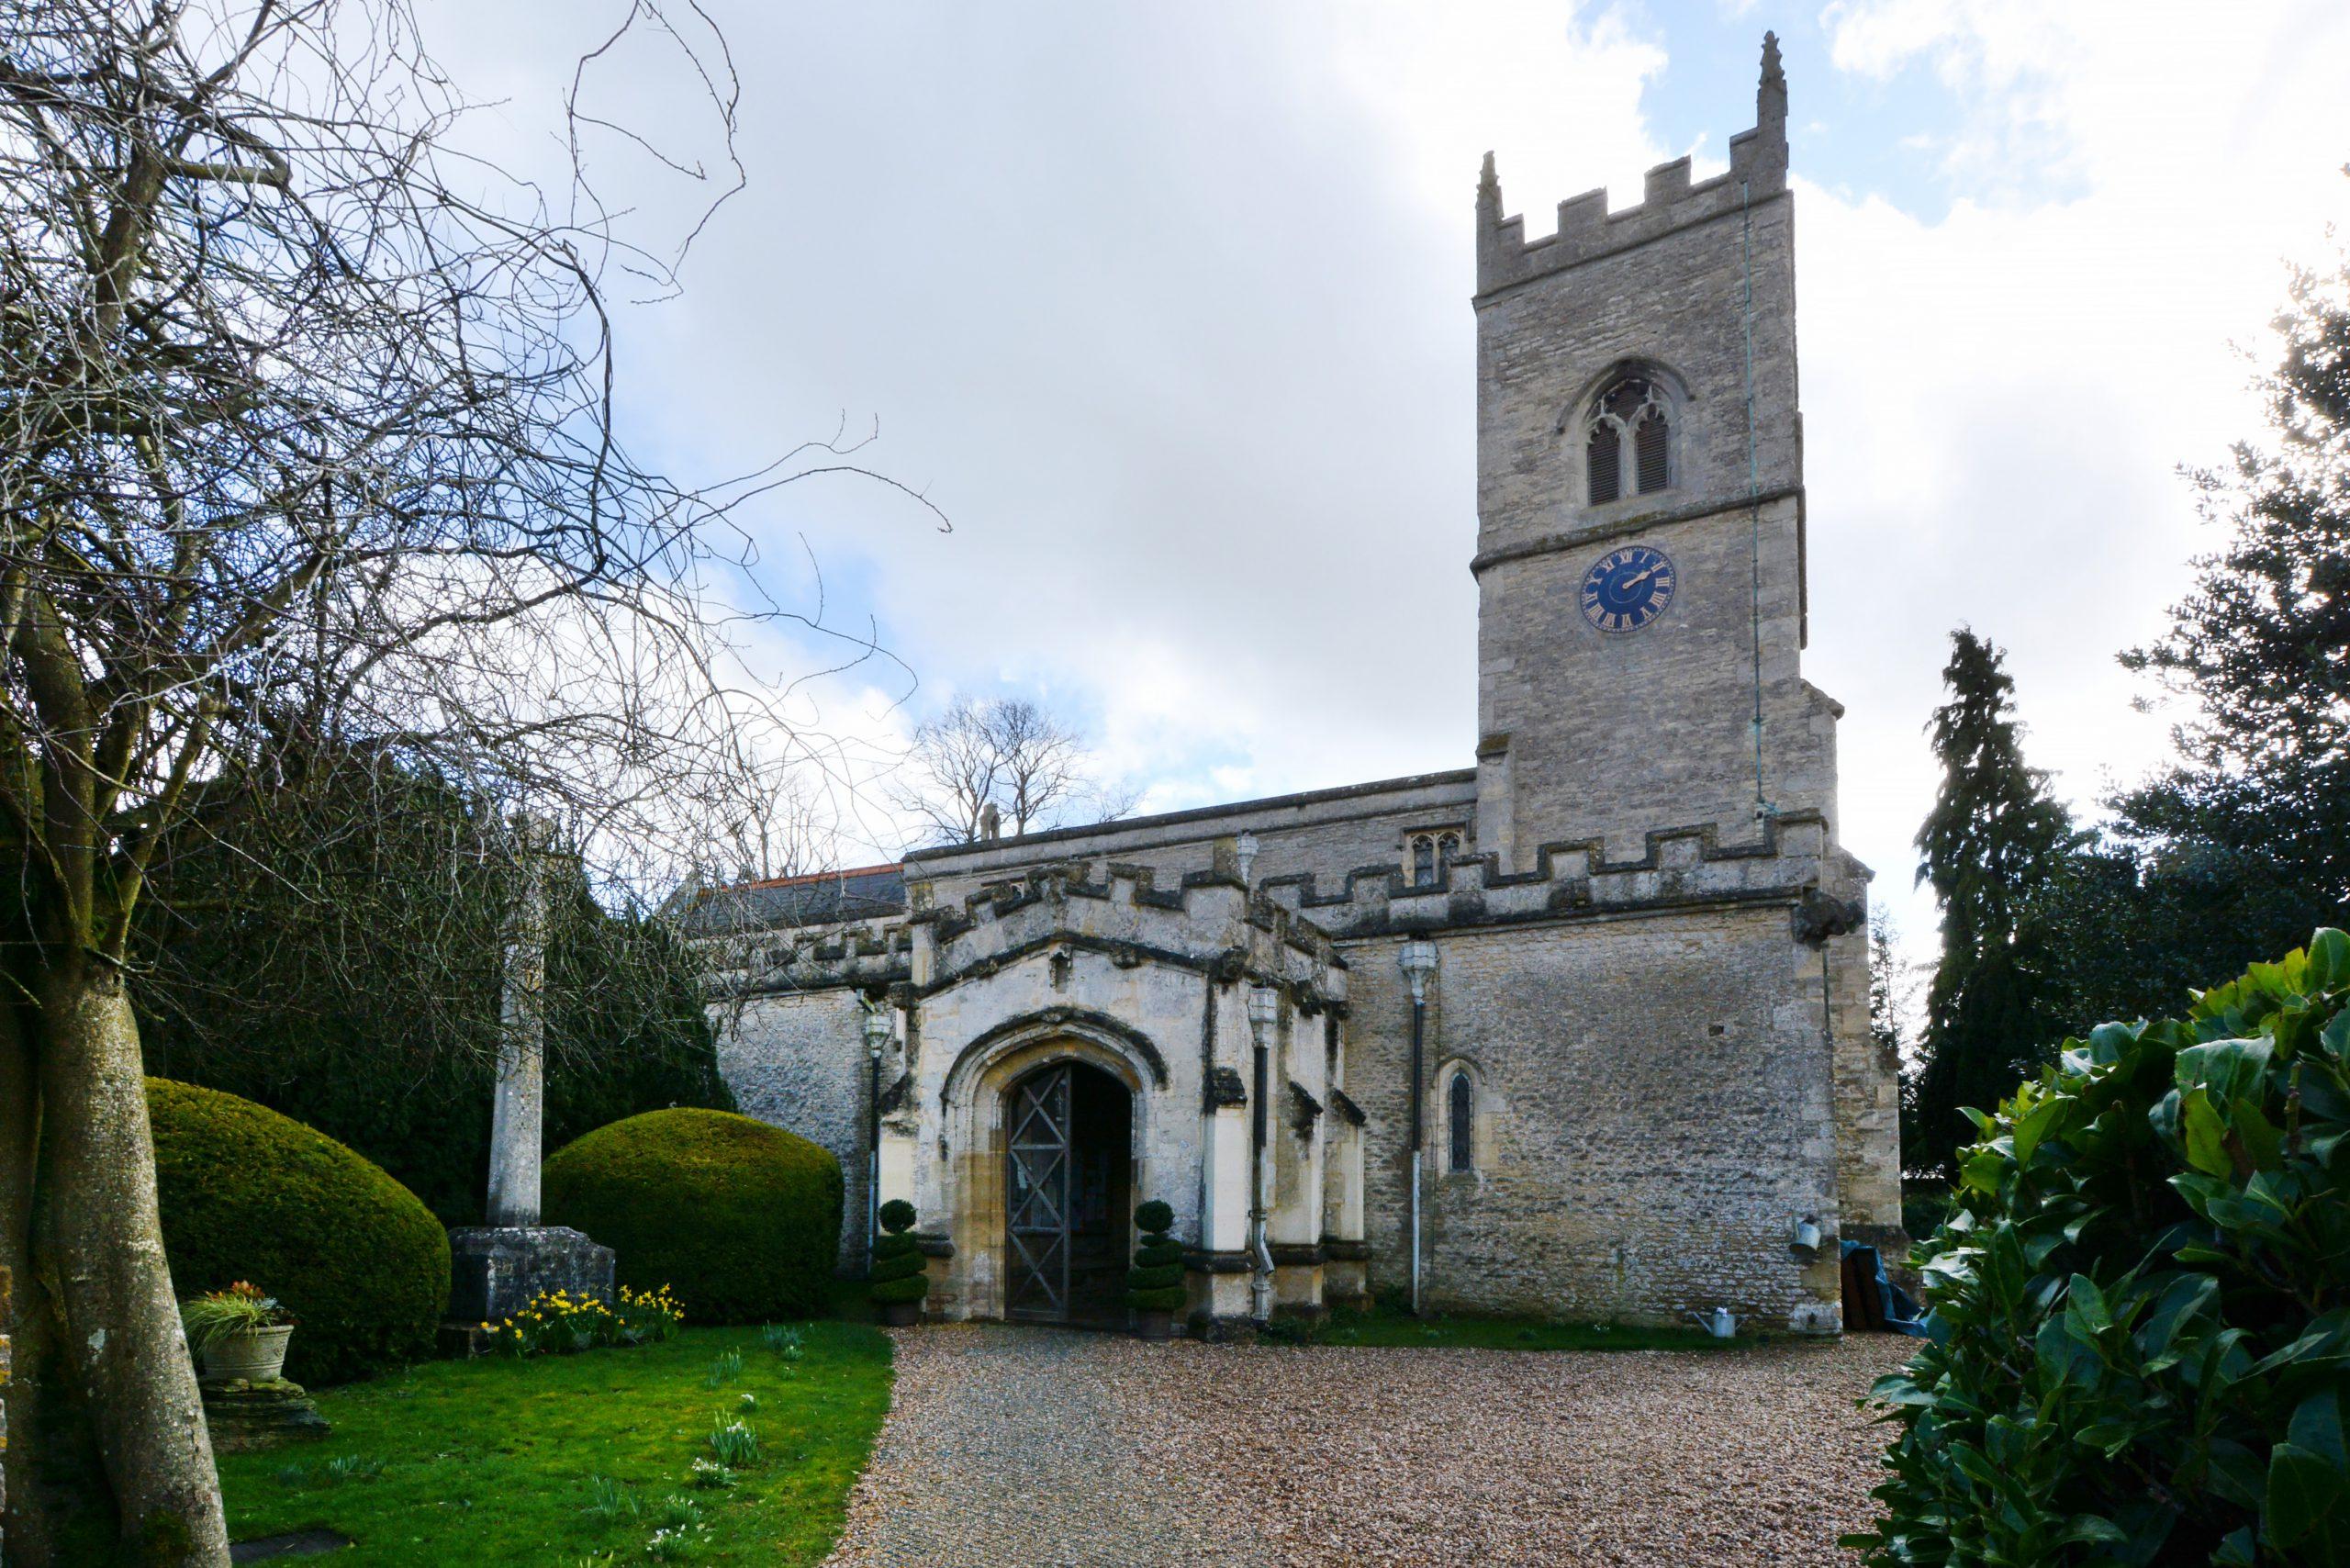 Church in Rural Oxfordshire